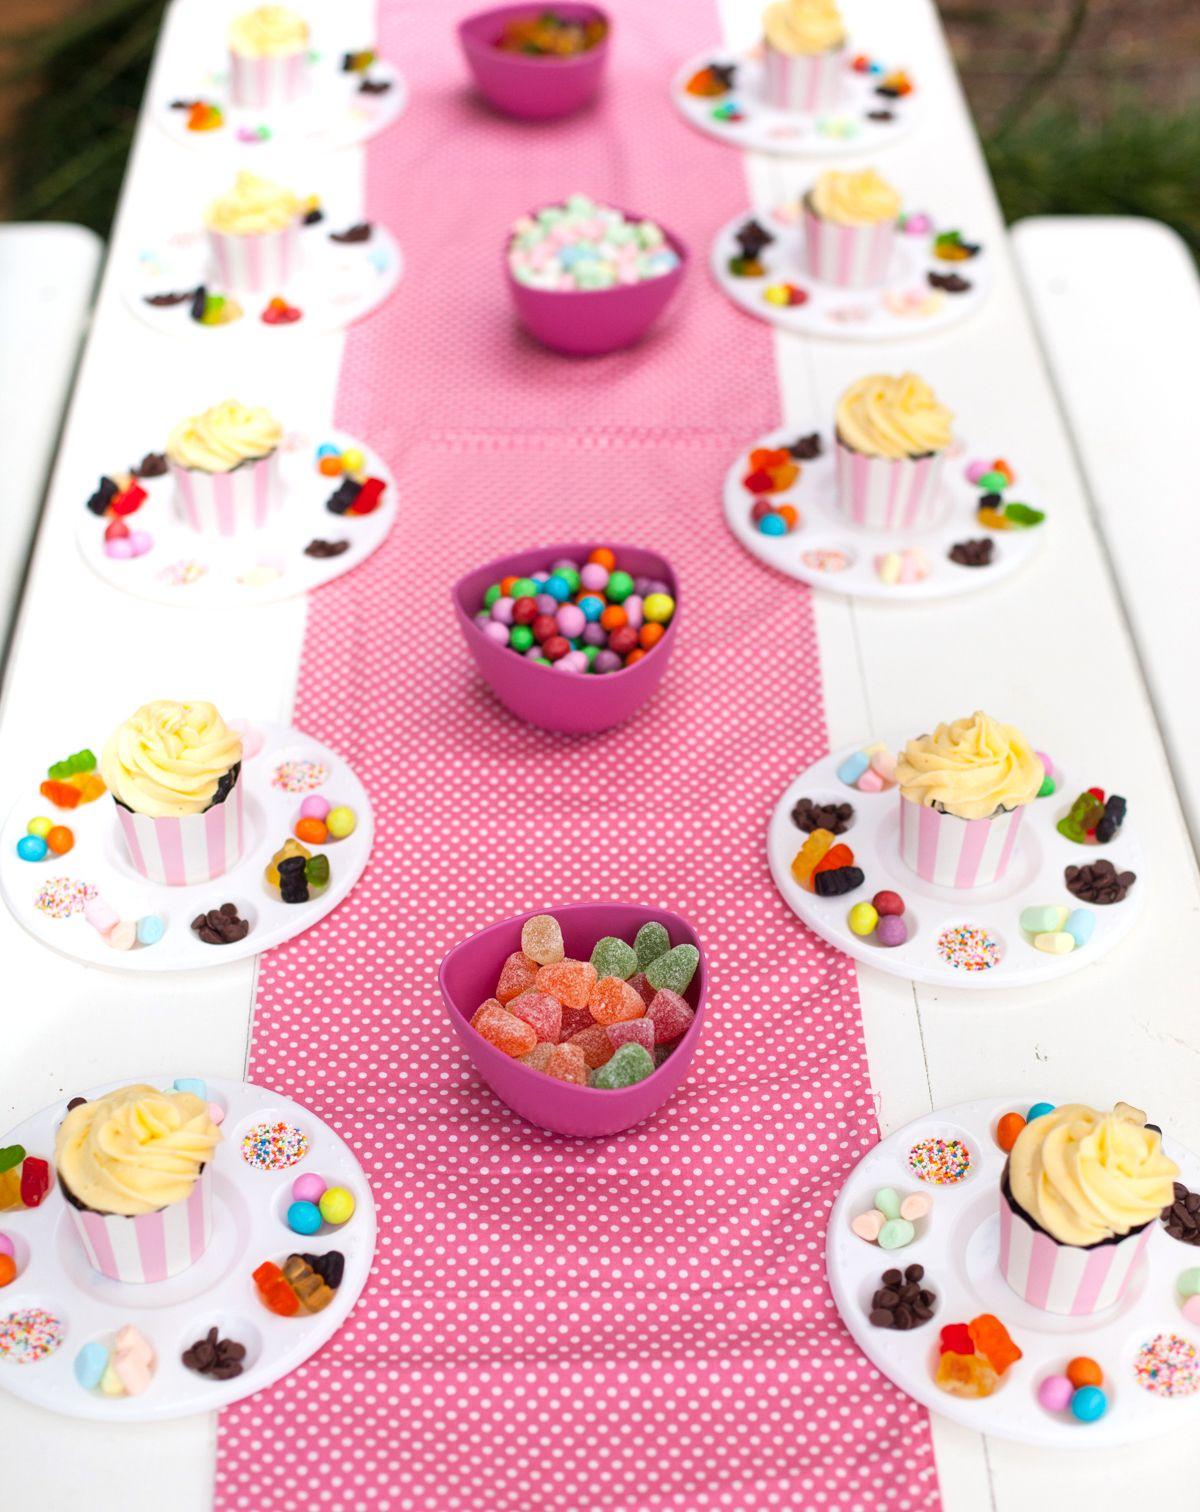 Shabby Chic Bake Shoppe Party